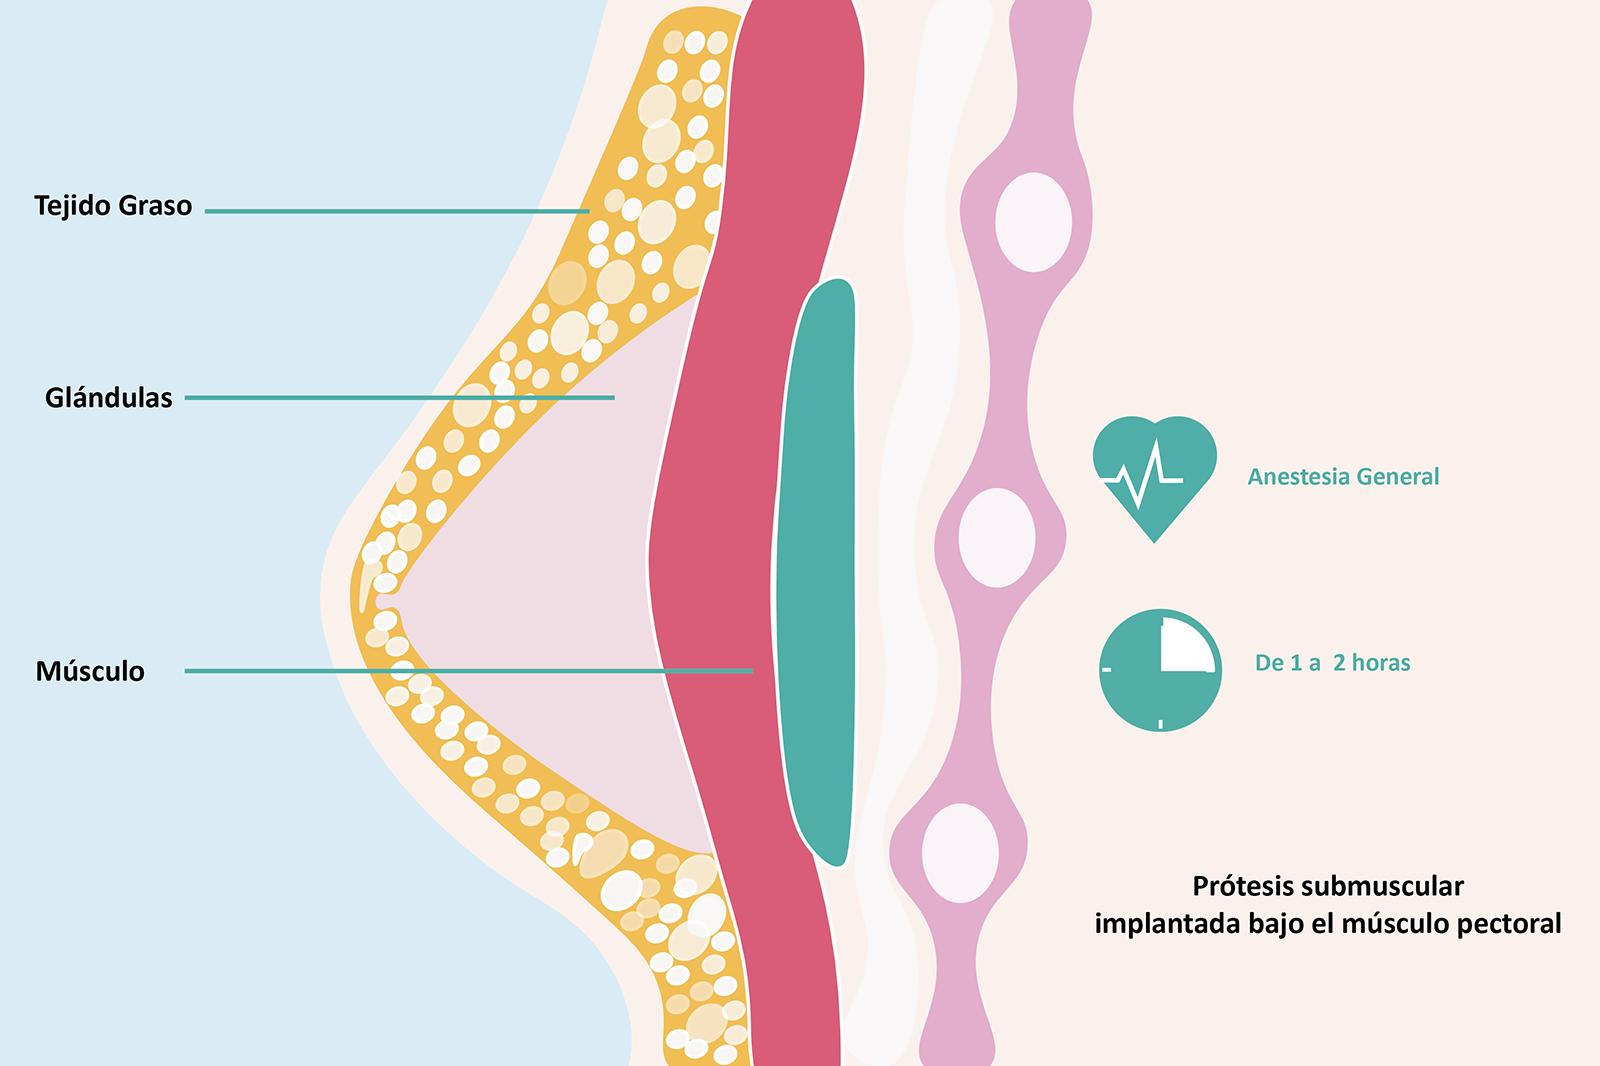 Mamoplastia-Cirugía-Plástica-Clínica-Rotger-Hospital-Mallorca